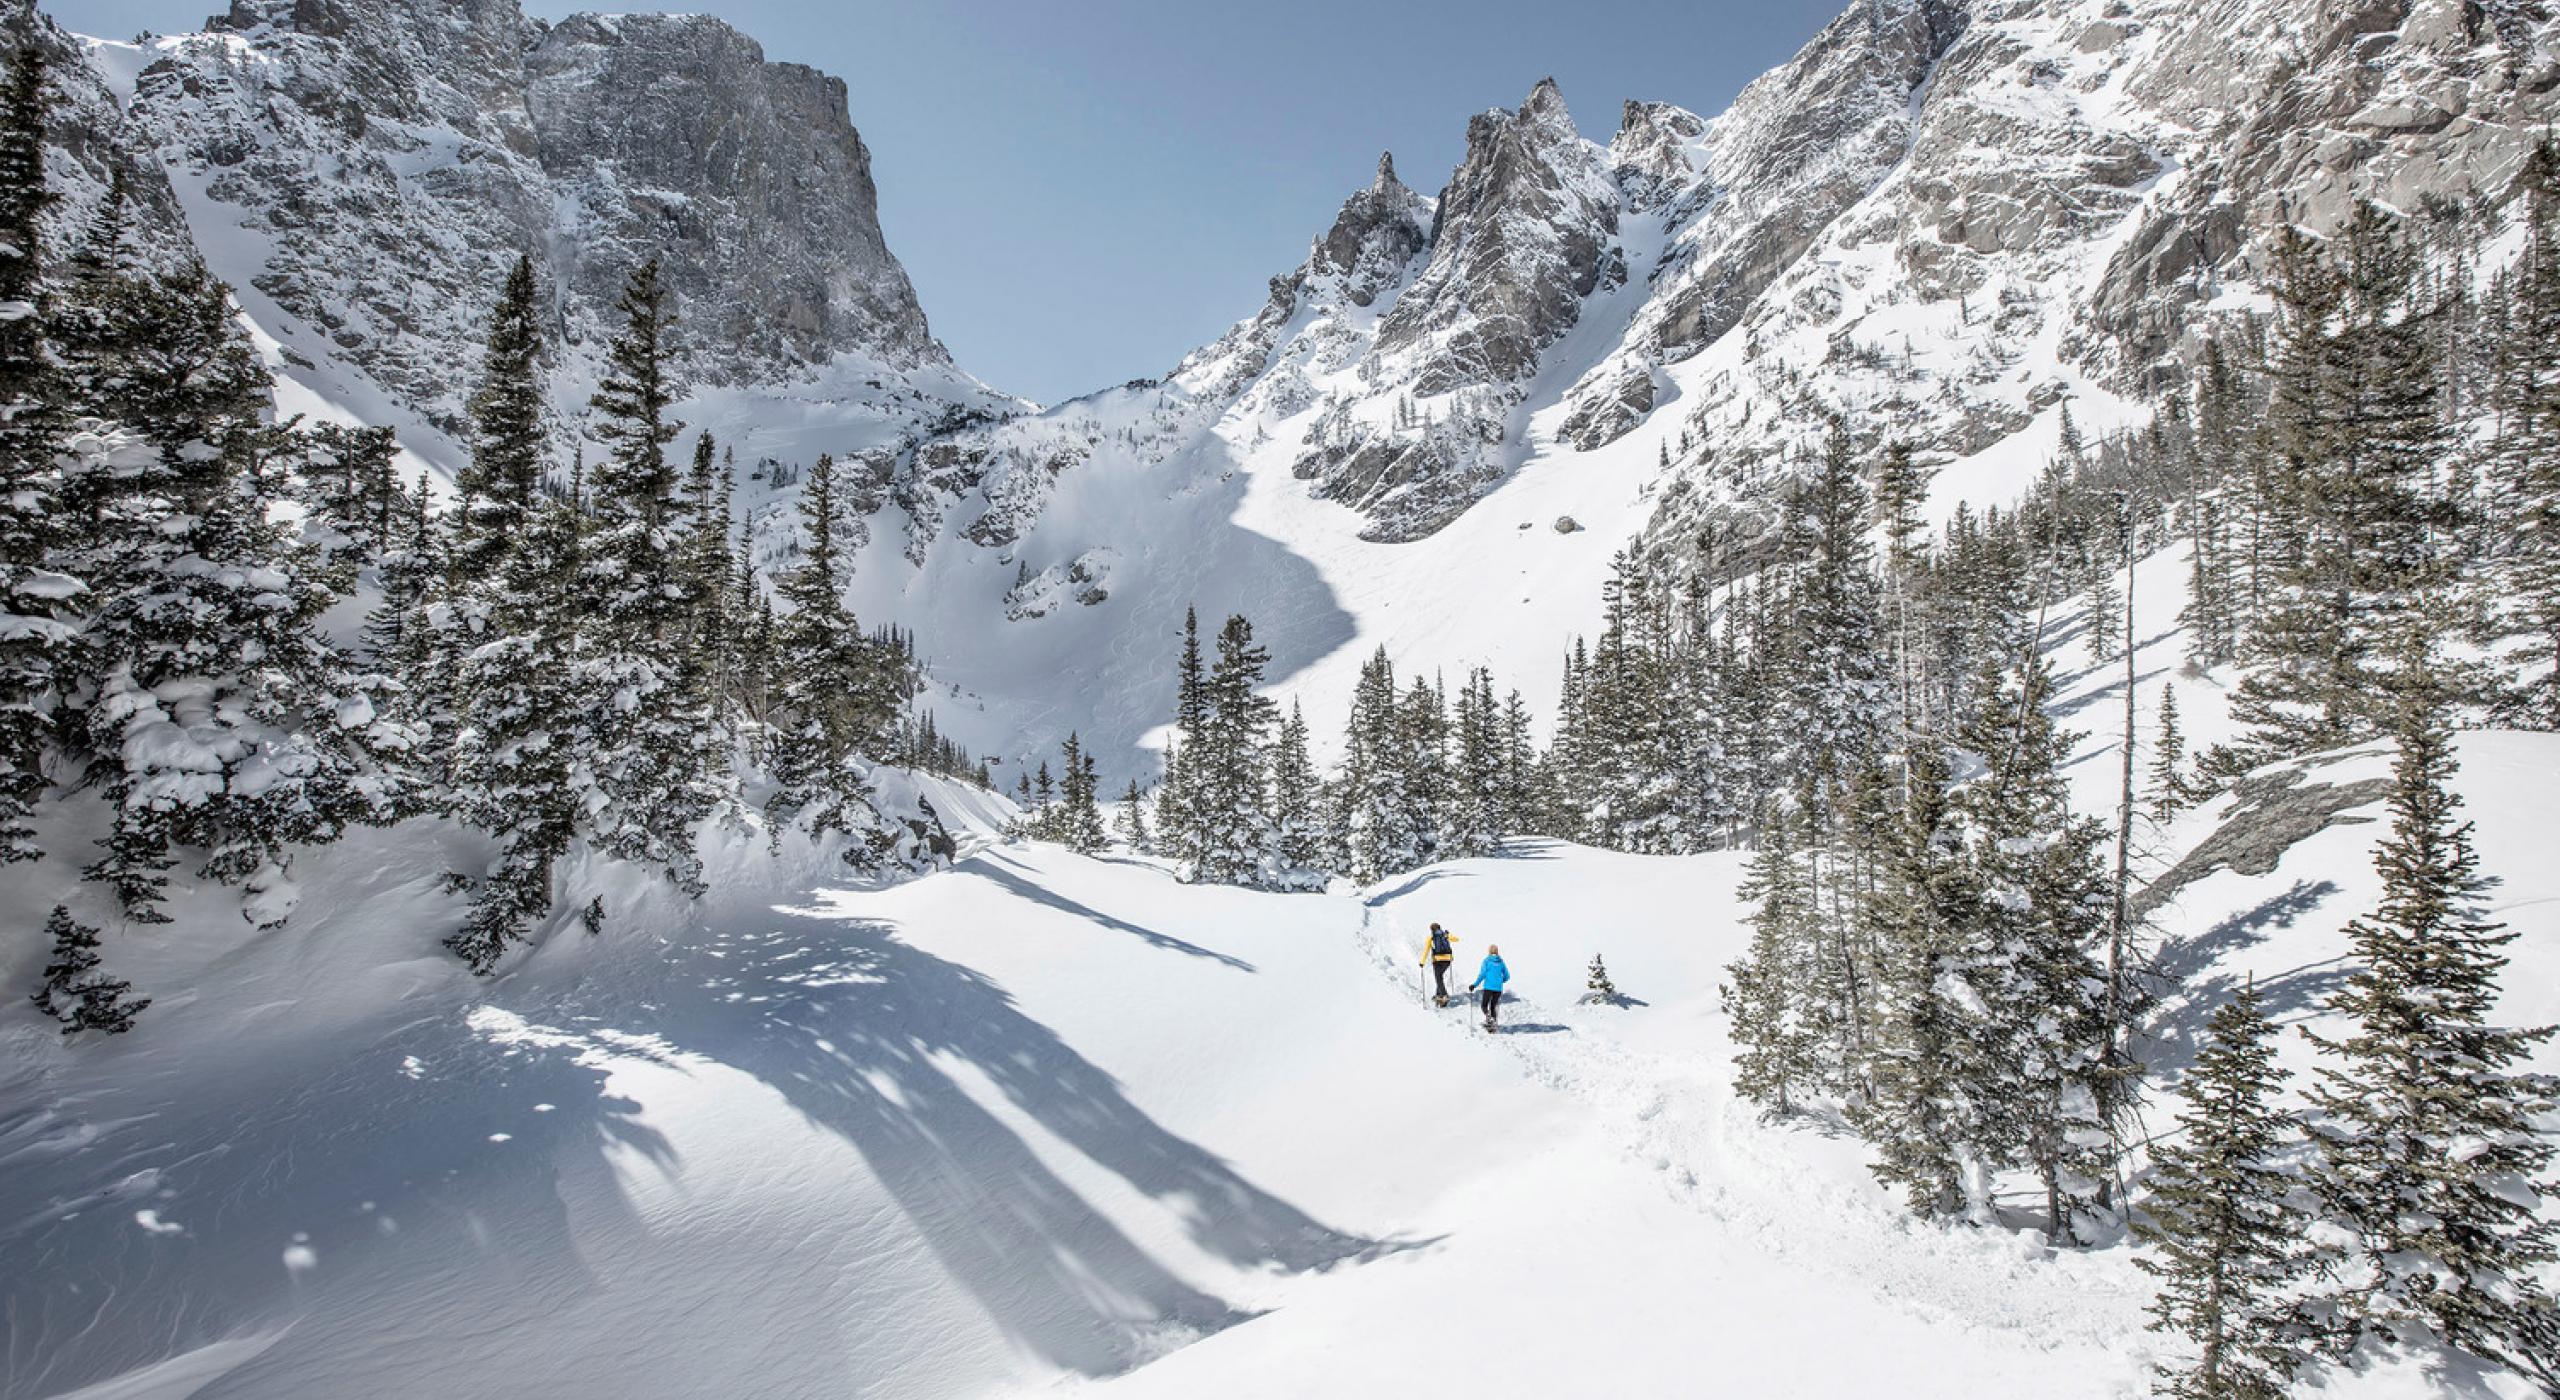 Estes Park Colorado Grand Scenery And Adventure